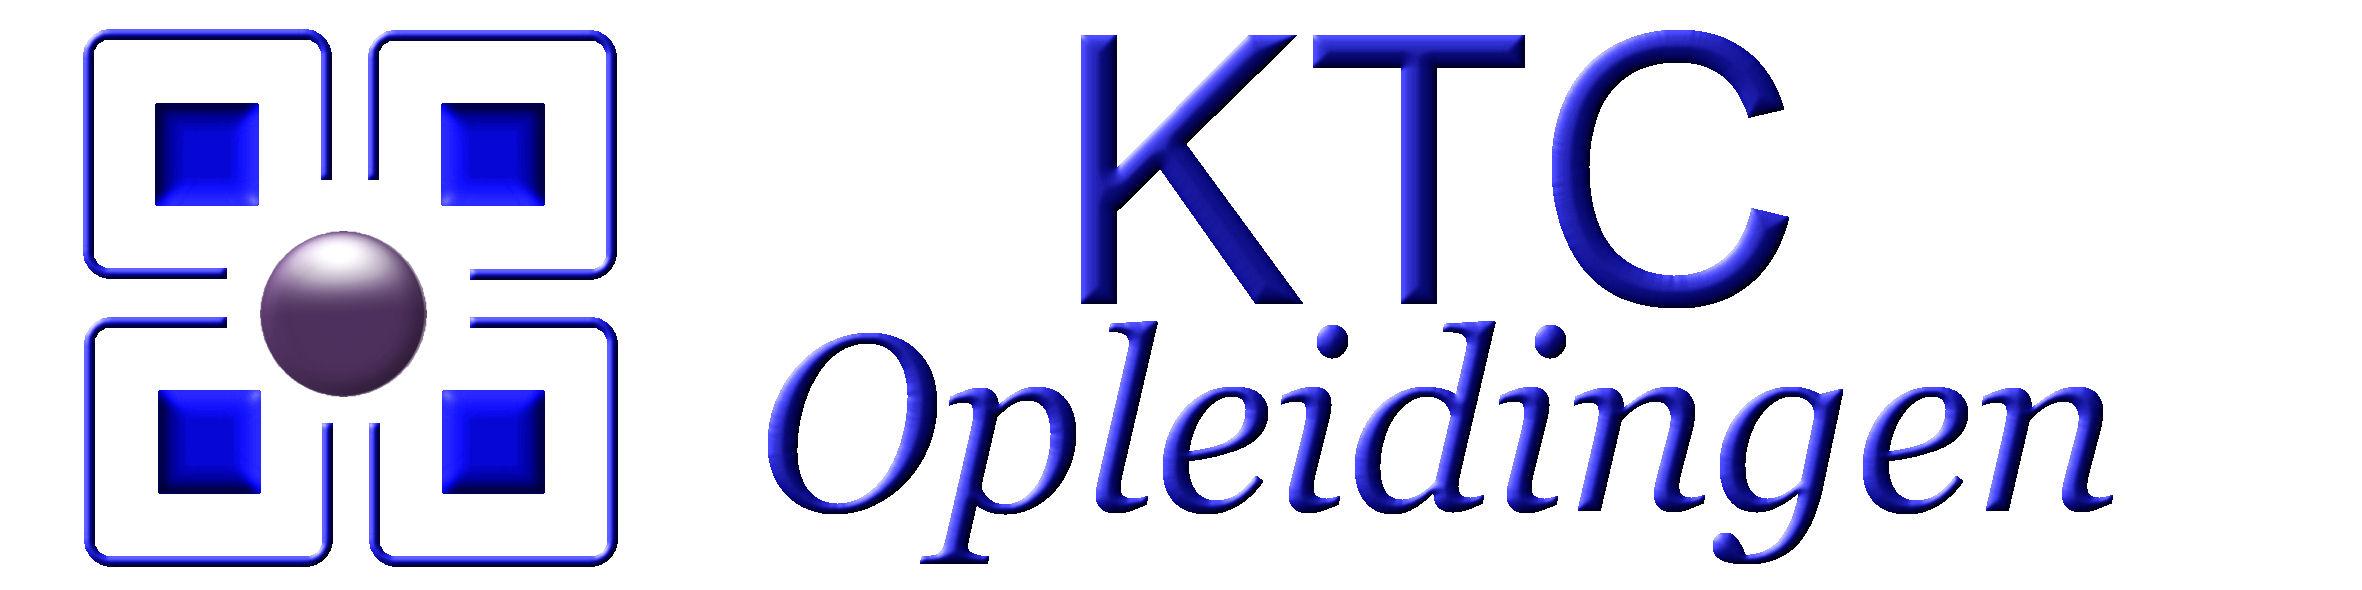 KTC Opleidingen